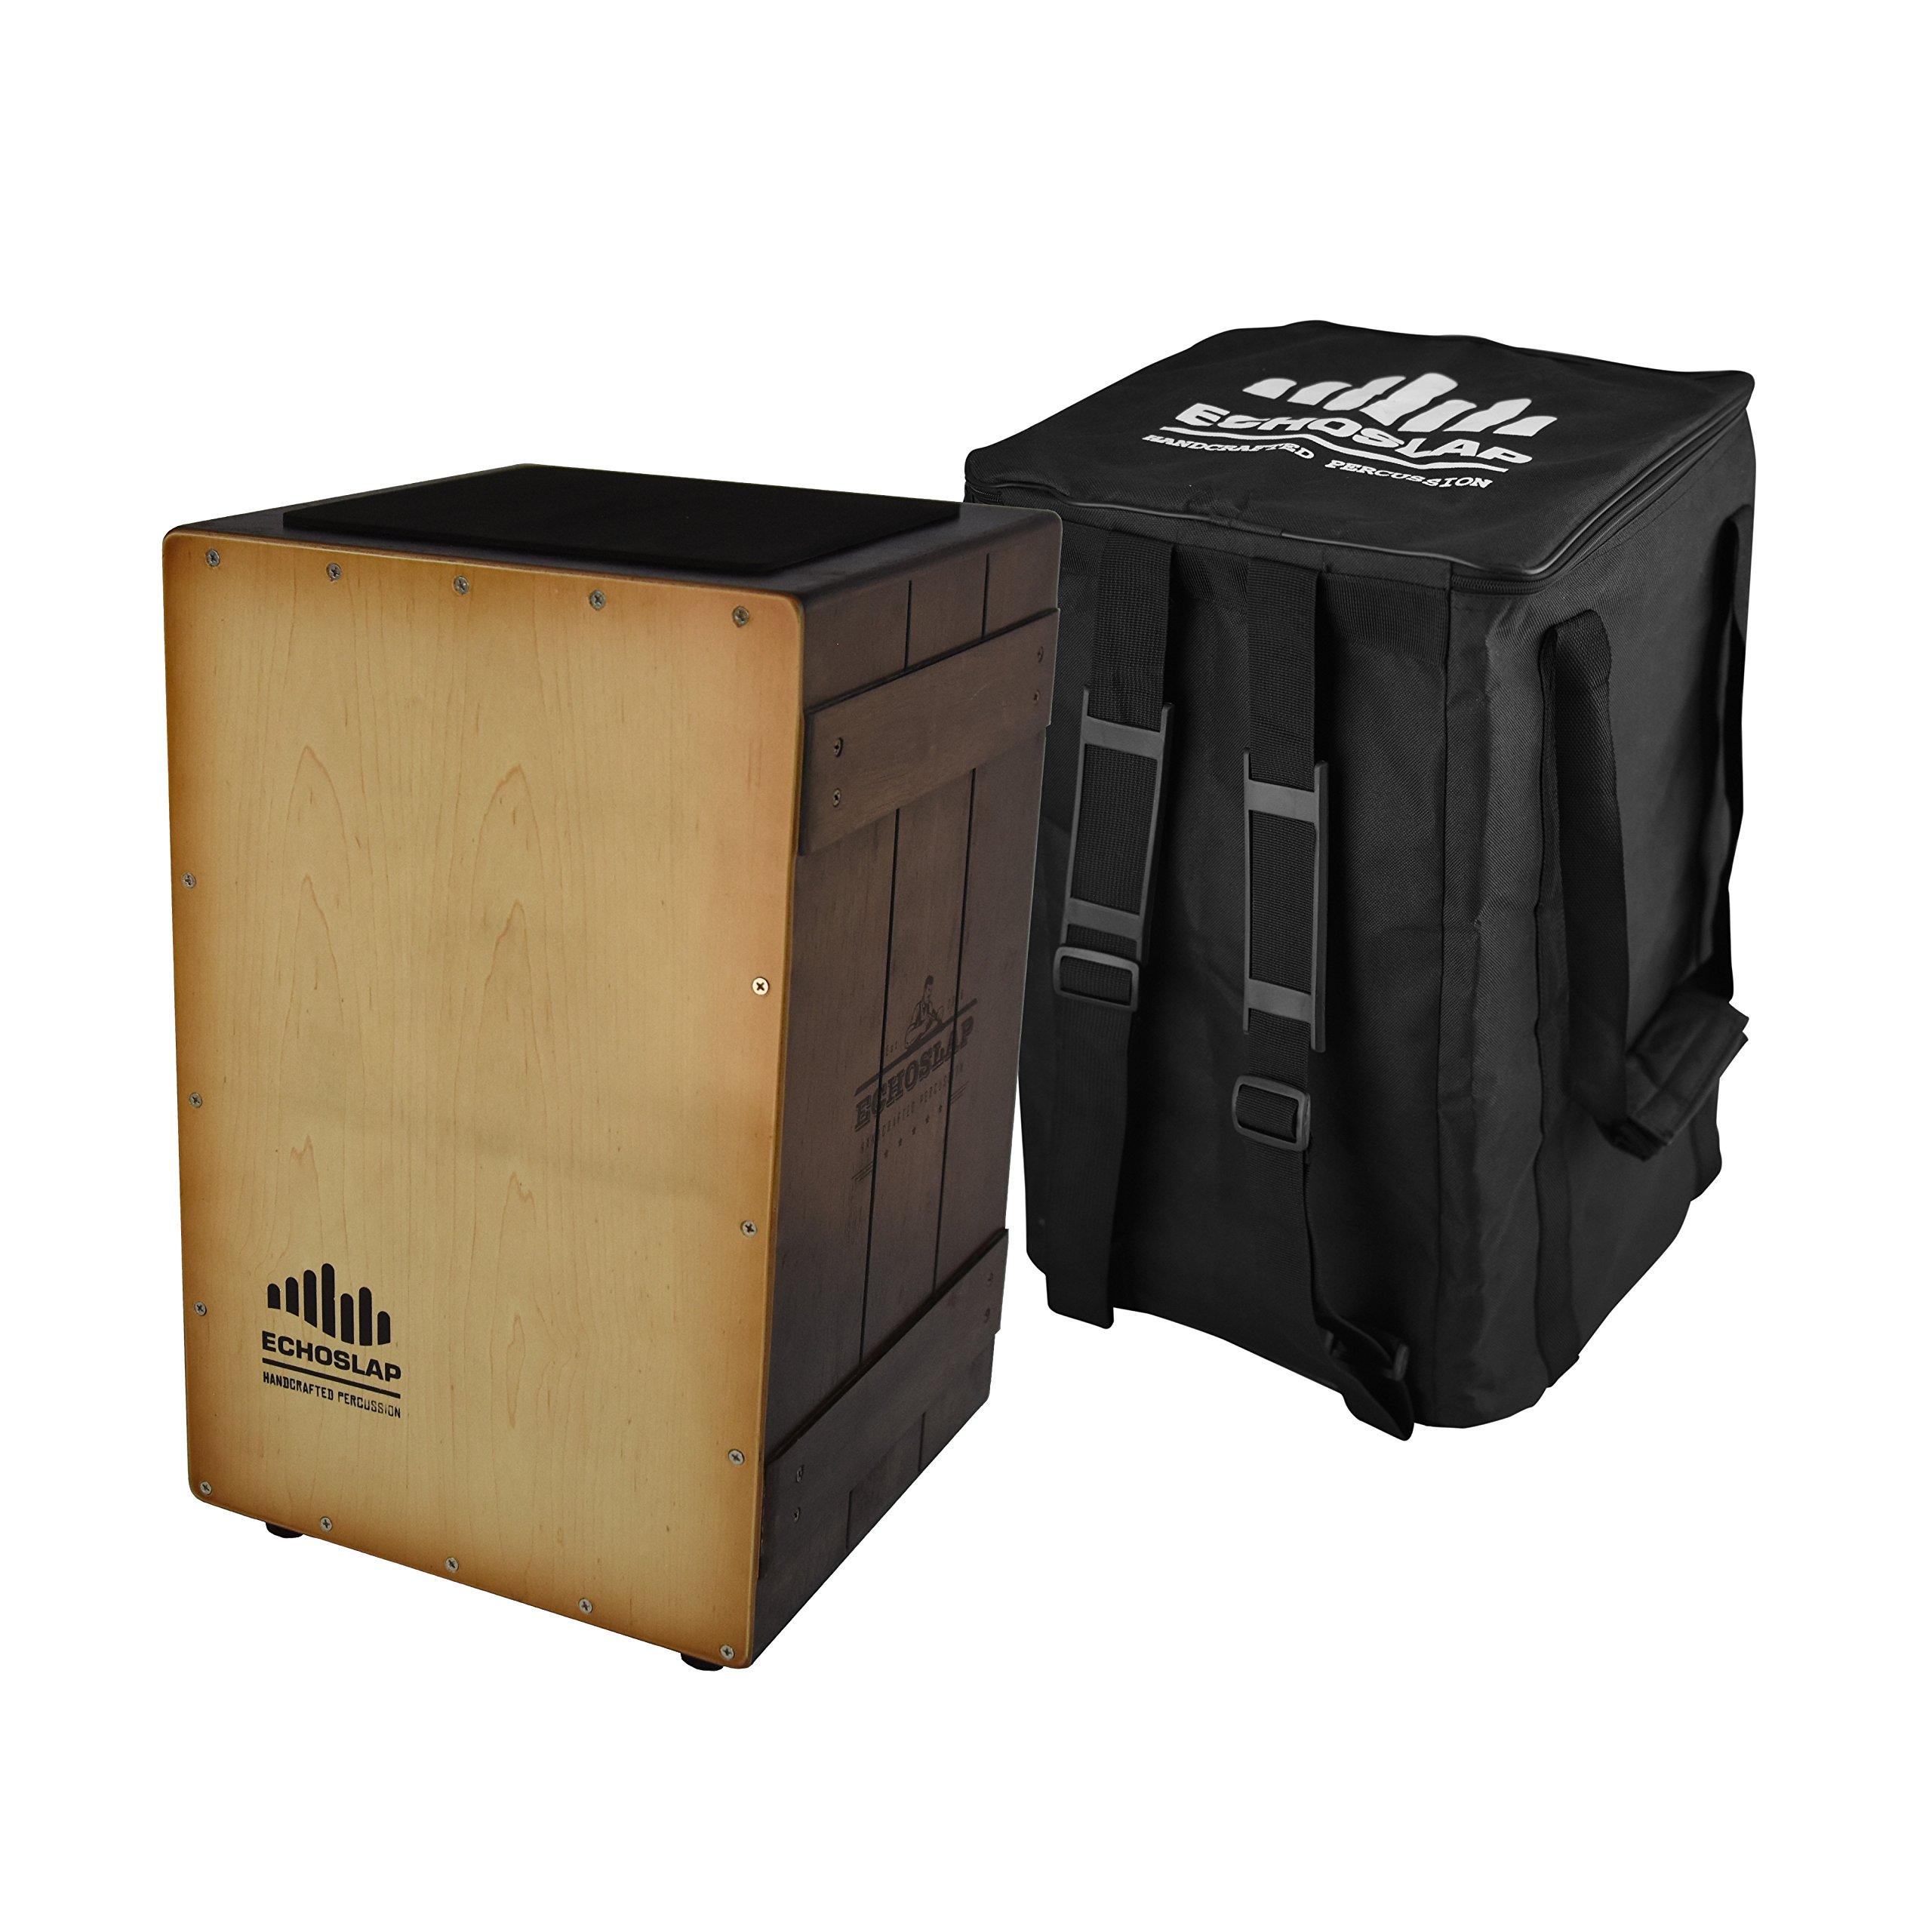 Echoslap Vintage Crate Cajon -Sunburst, Hand Crafted, Siam Oak Body, Maple Front Adjustable Snare